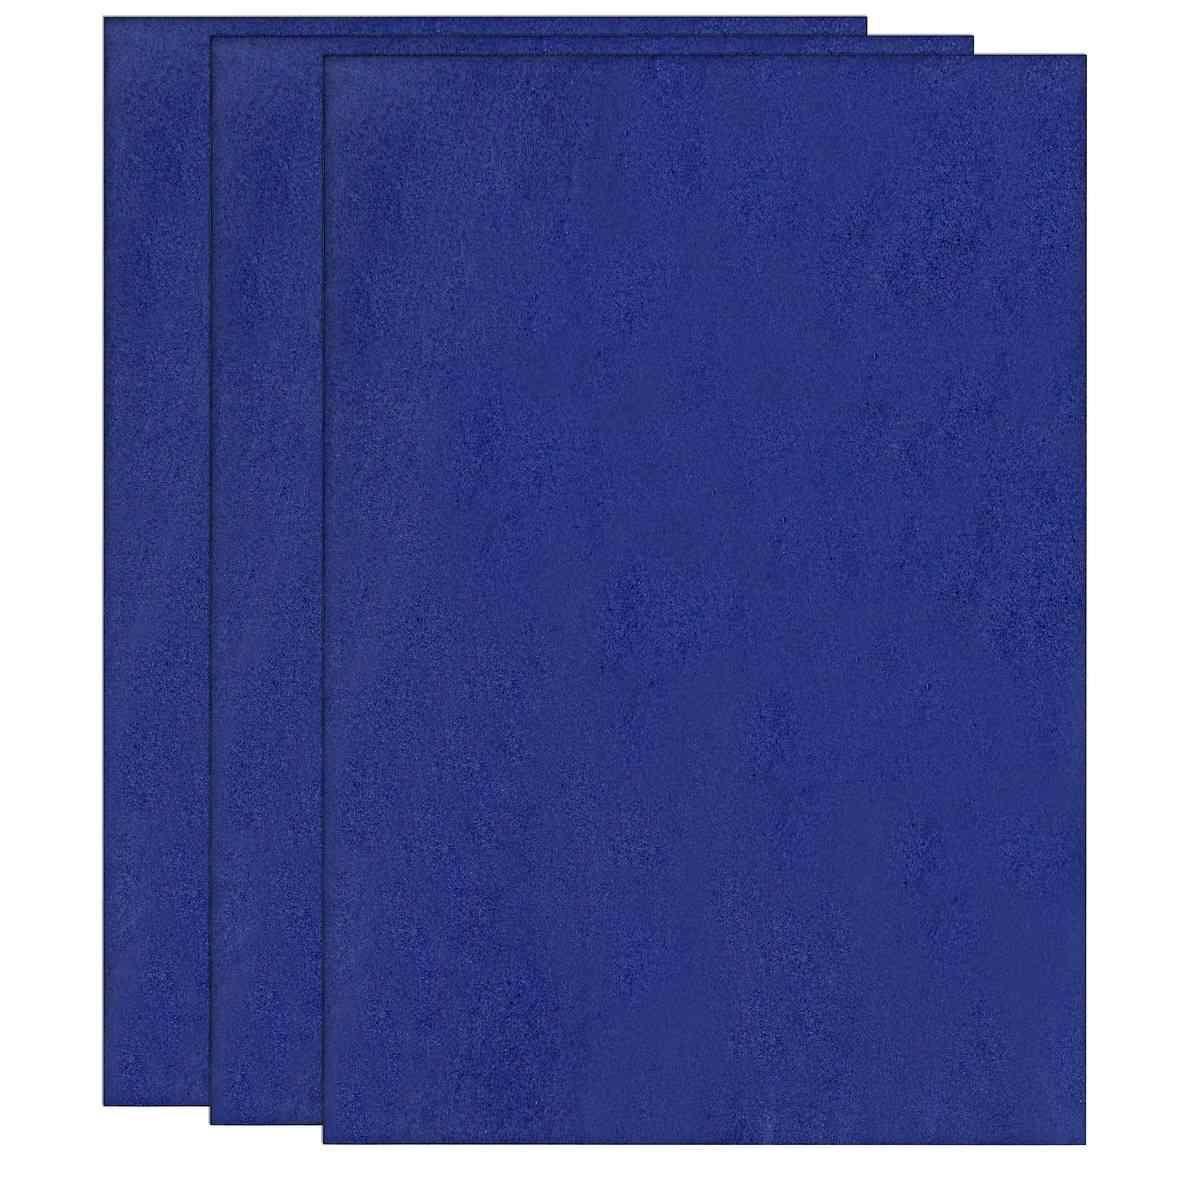 Foam Sheets A4 Size Without Sticker 3MM Dark Blue